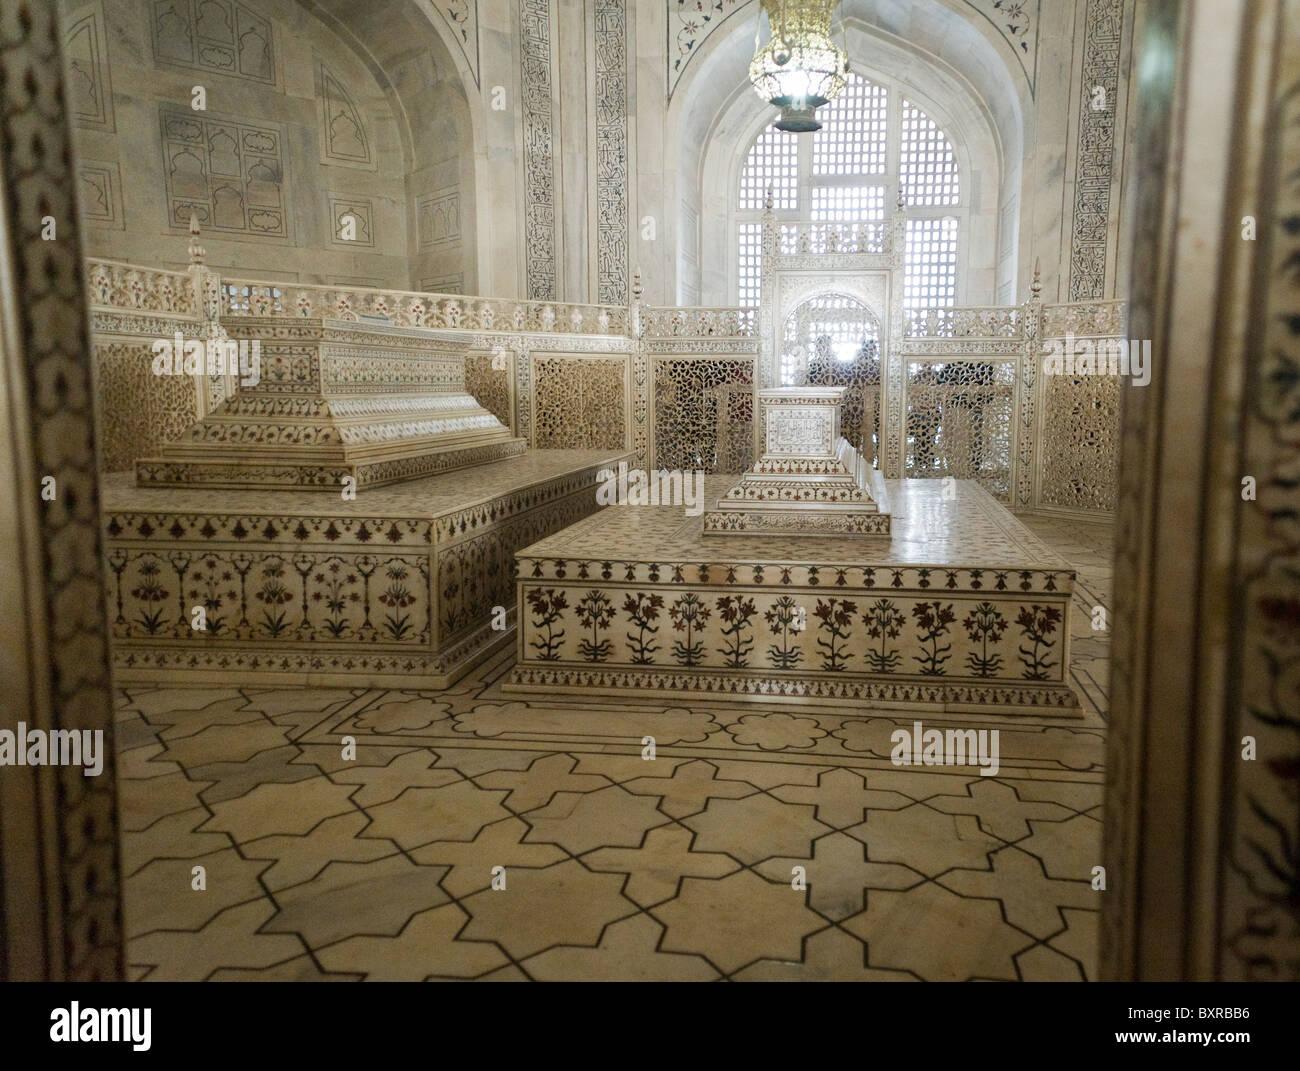 The Cenotaph Of Mumtaz Mahal And Shah Jahan Inside The Taj Mahal In Agra  India